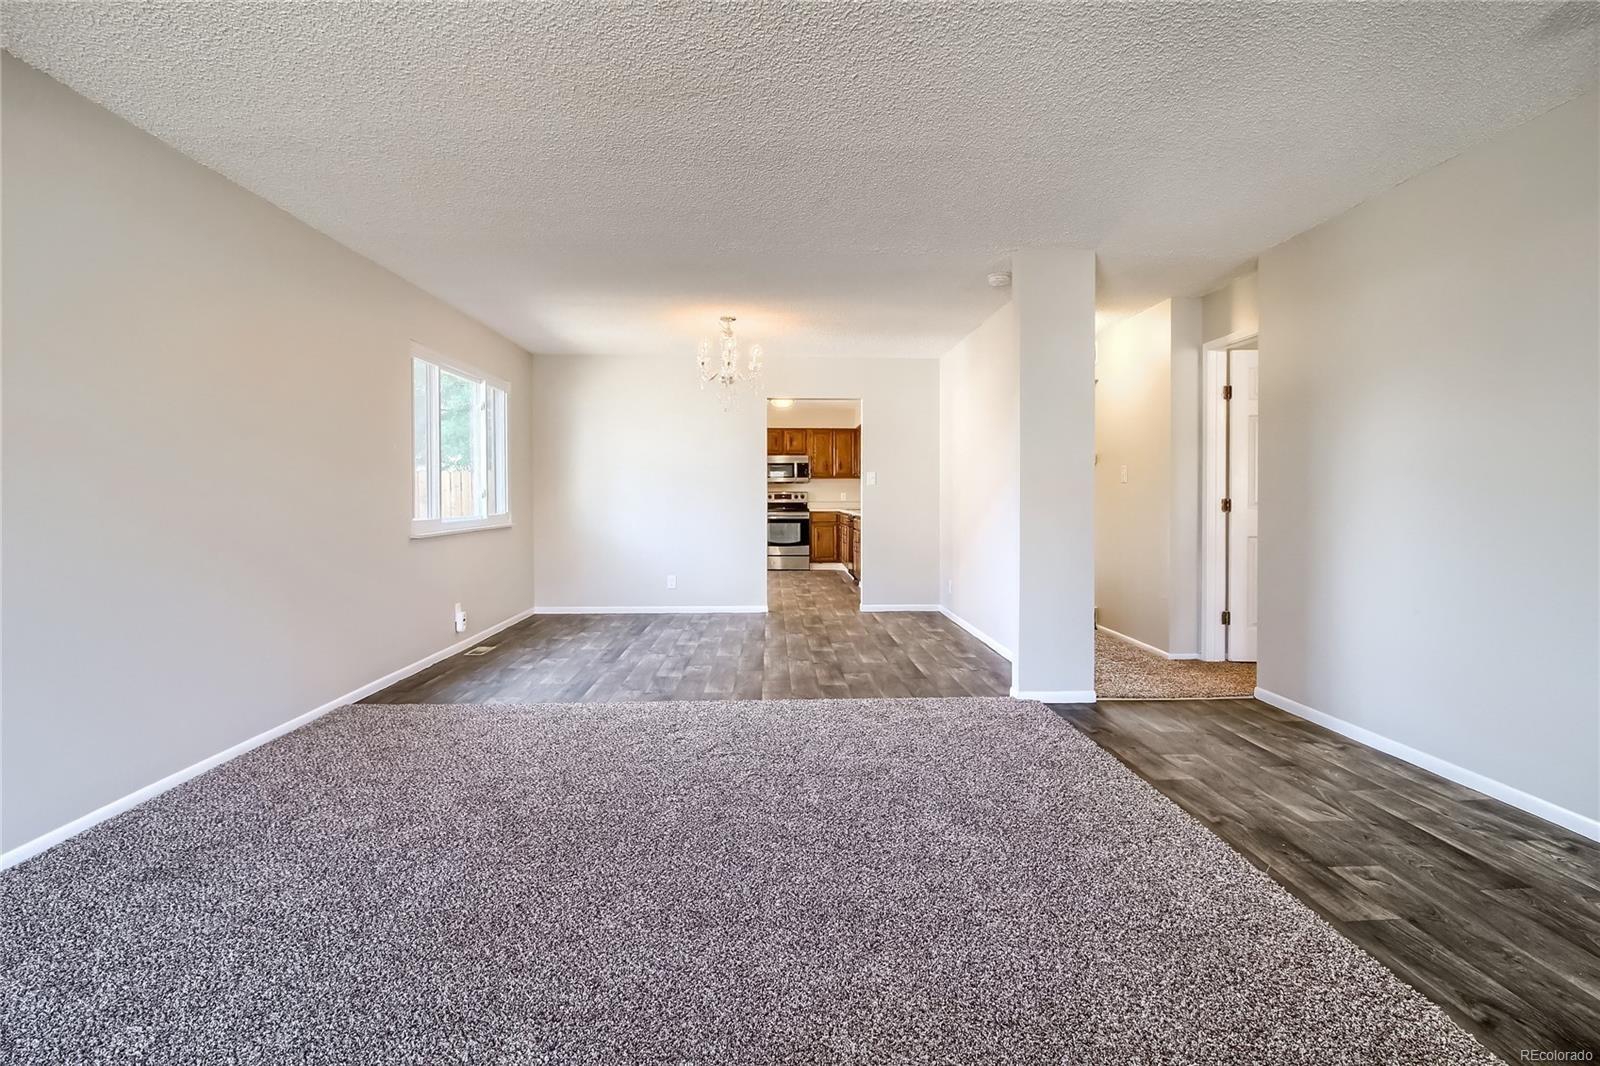 MLS# 4817896 - 6 - 5080 Worchester Street, Denver, CO 80239